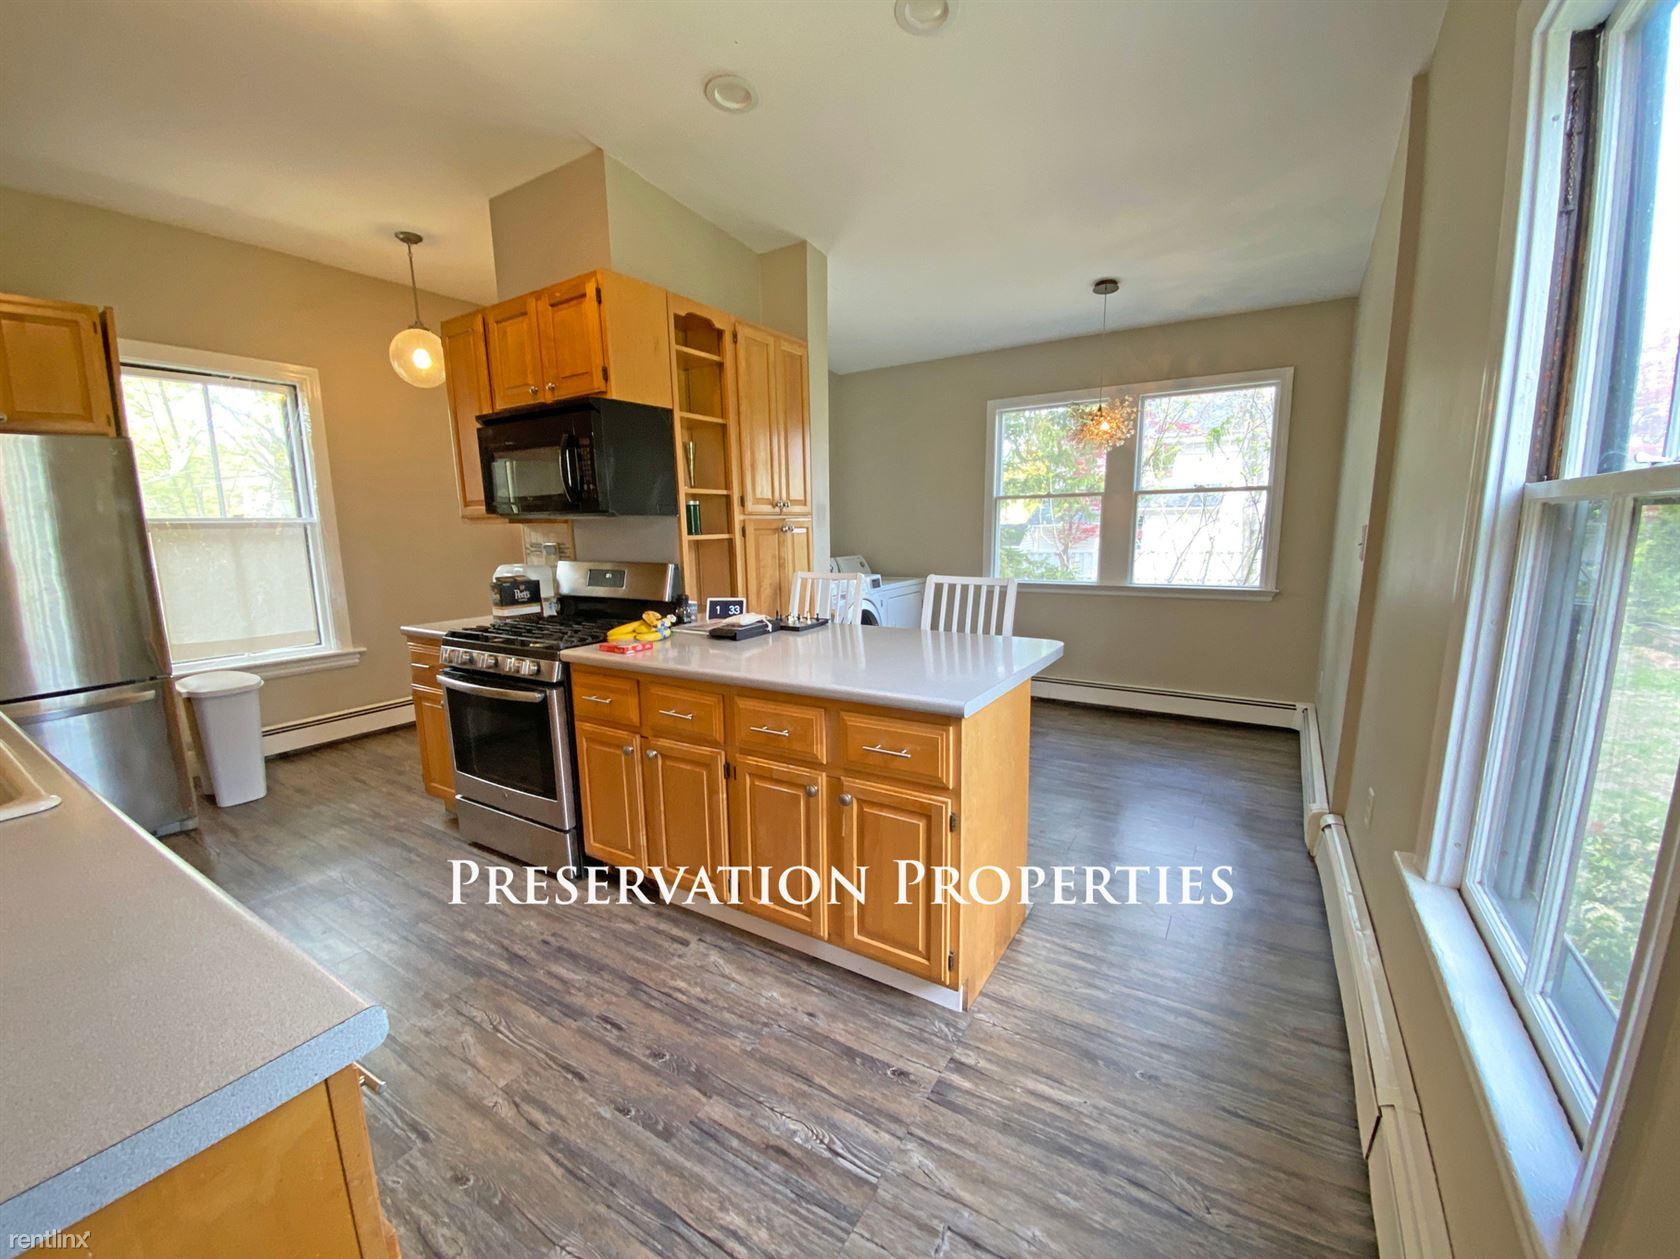 263 Auburndale Ave, Auburndale, MA - $4,200 USD/ month